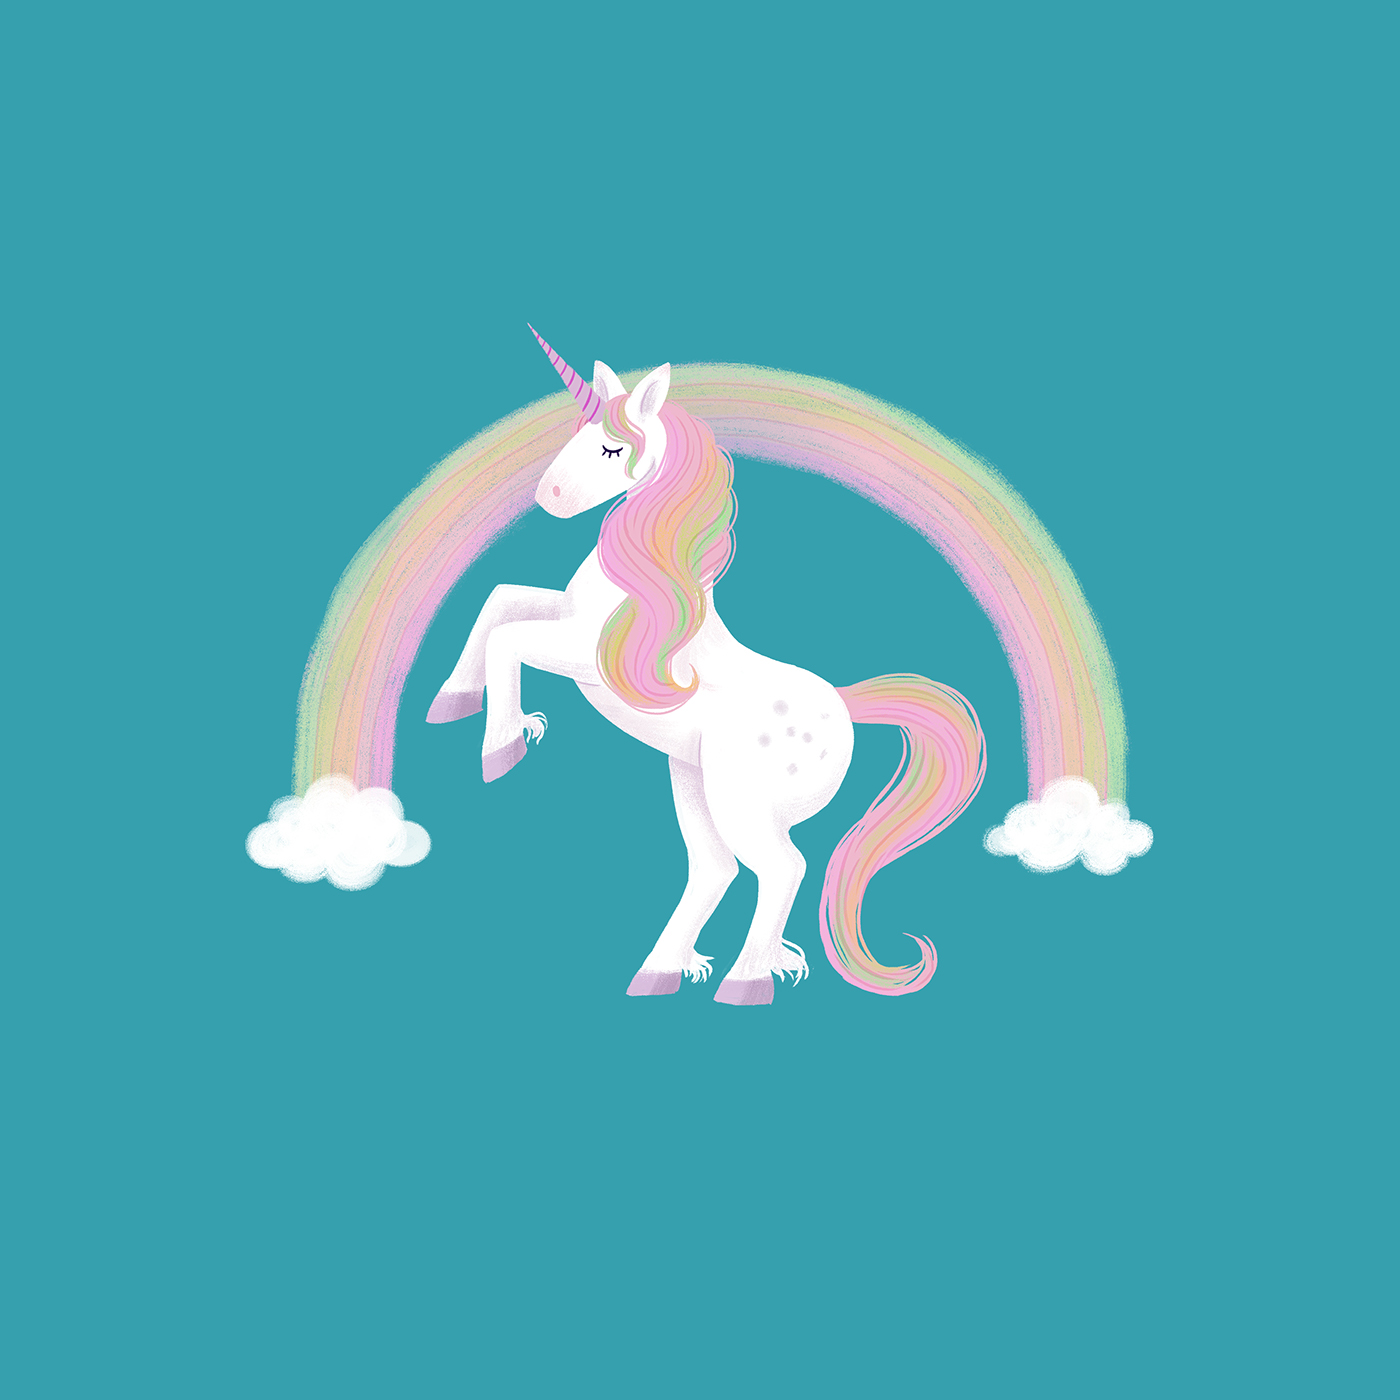 unicorn rainbow pattern design  surface design kids childrens illustration girls Magic   society6 artwork